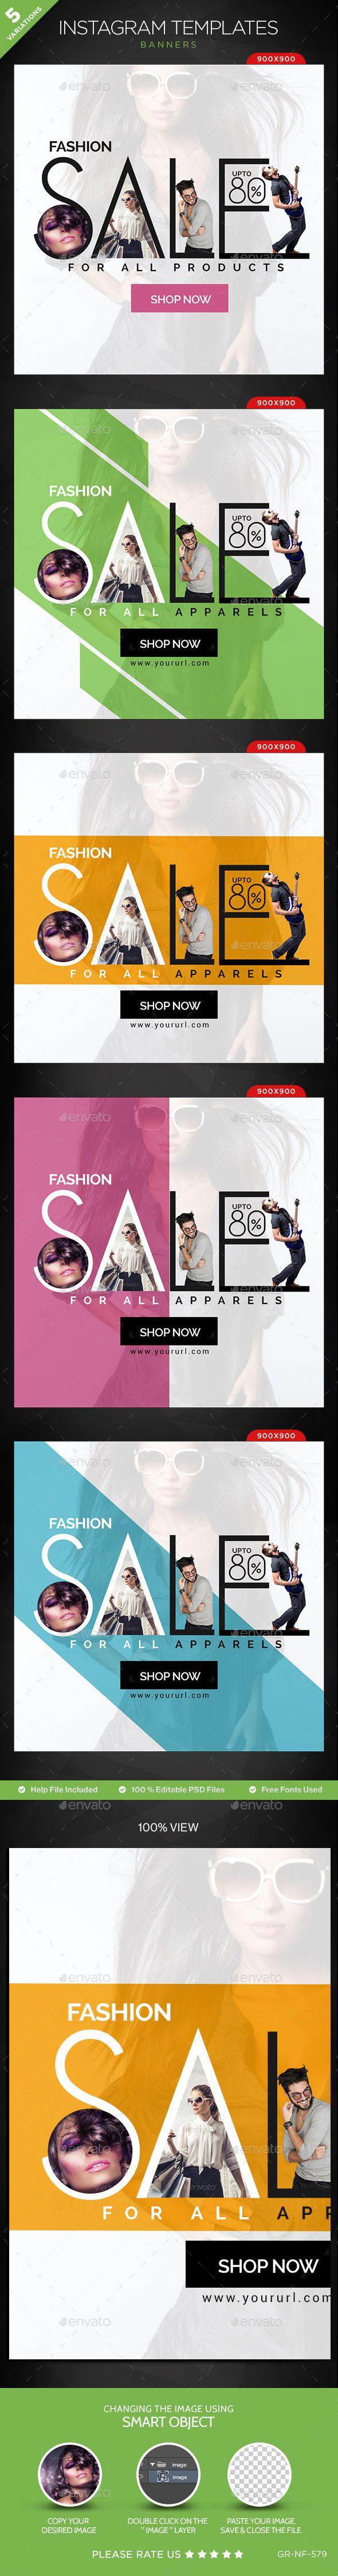 Sales Instagram Templates - 5 Designs - Banners & Ads Web Elements